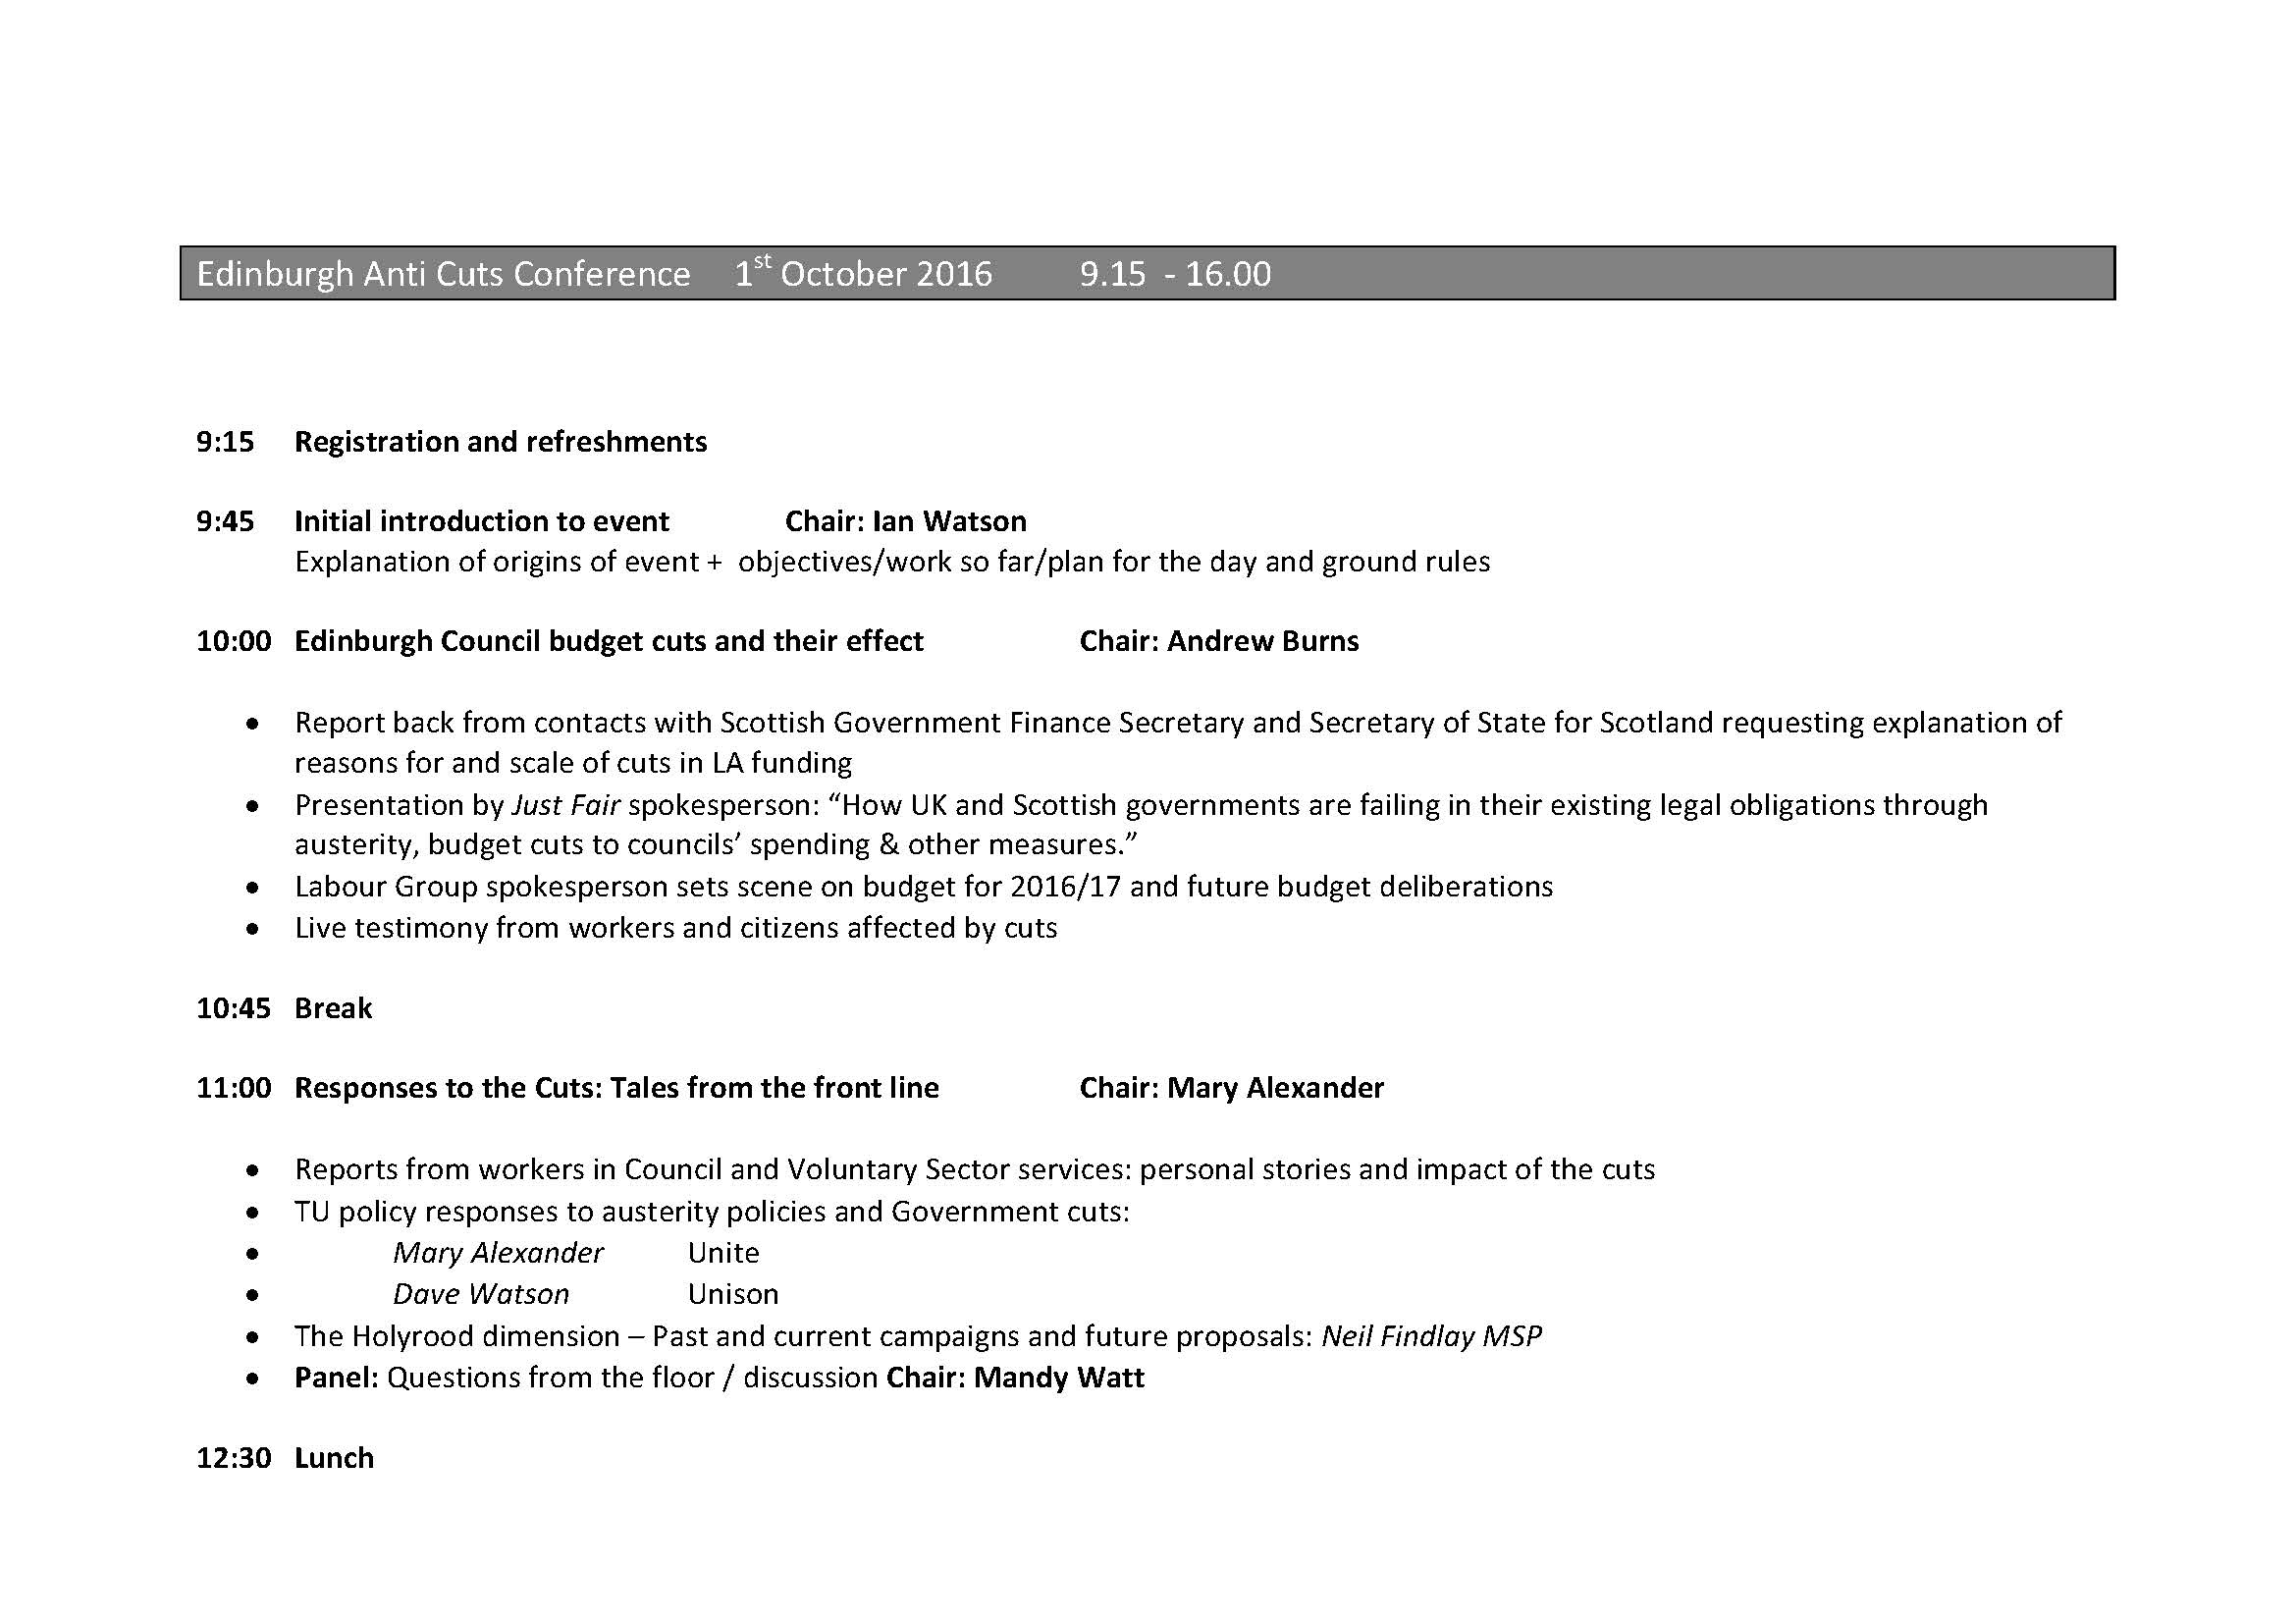 Edinburgh_Anti_Cuts_Conference__Delegate_Agenda_Page_1.jpg